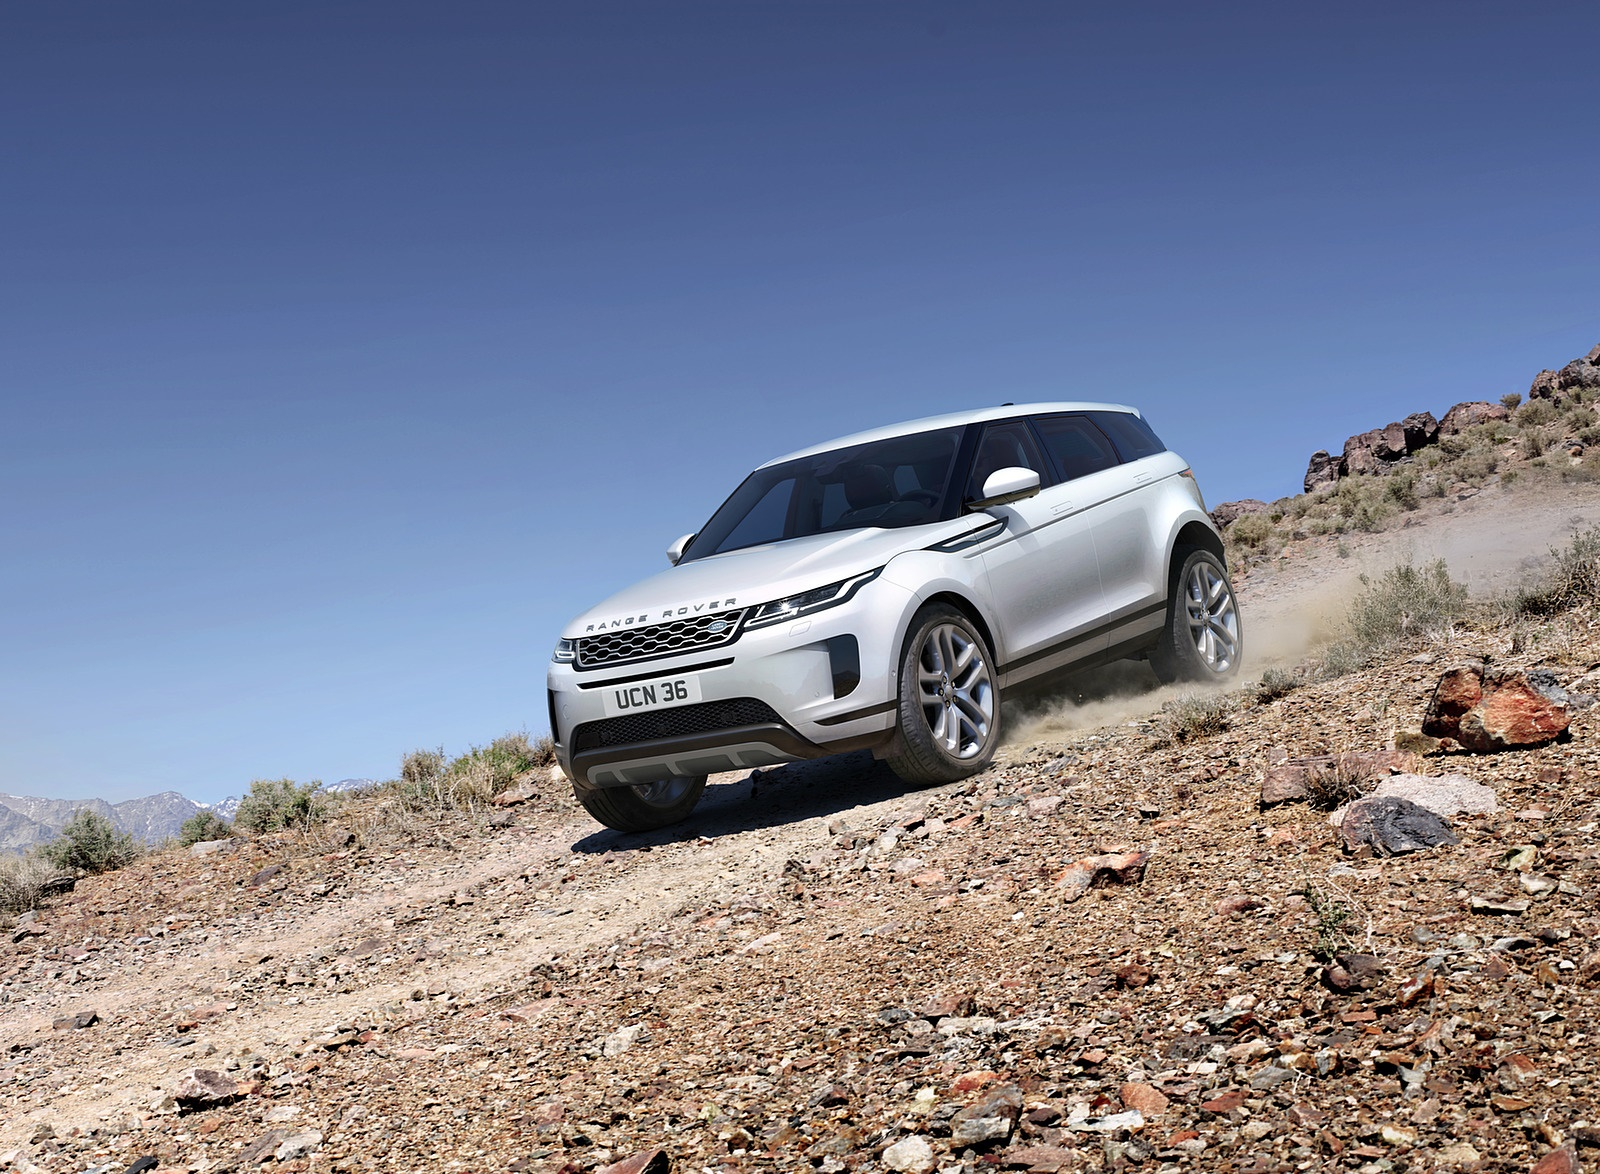 2020 Range Rover Evoque Front Three Quarter Wallpaper 93 Hd